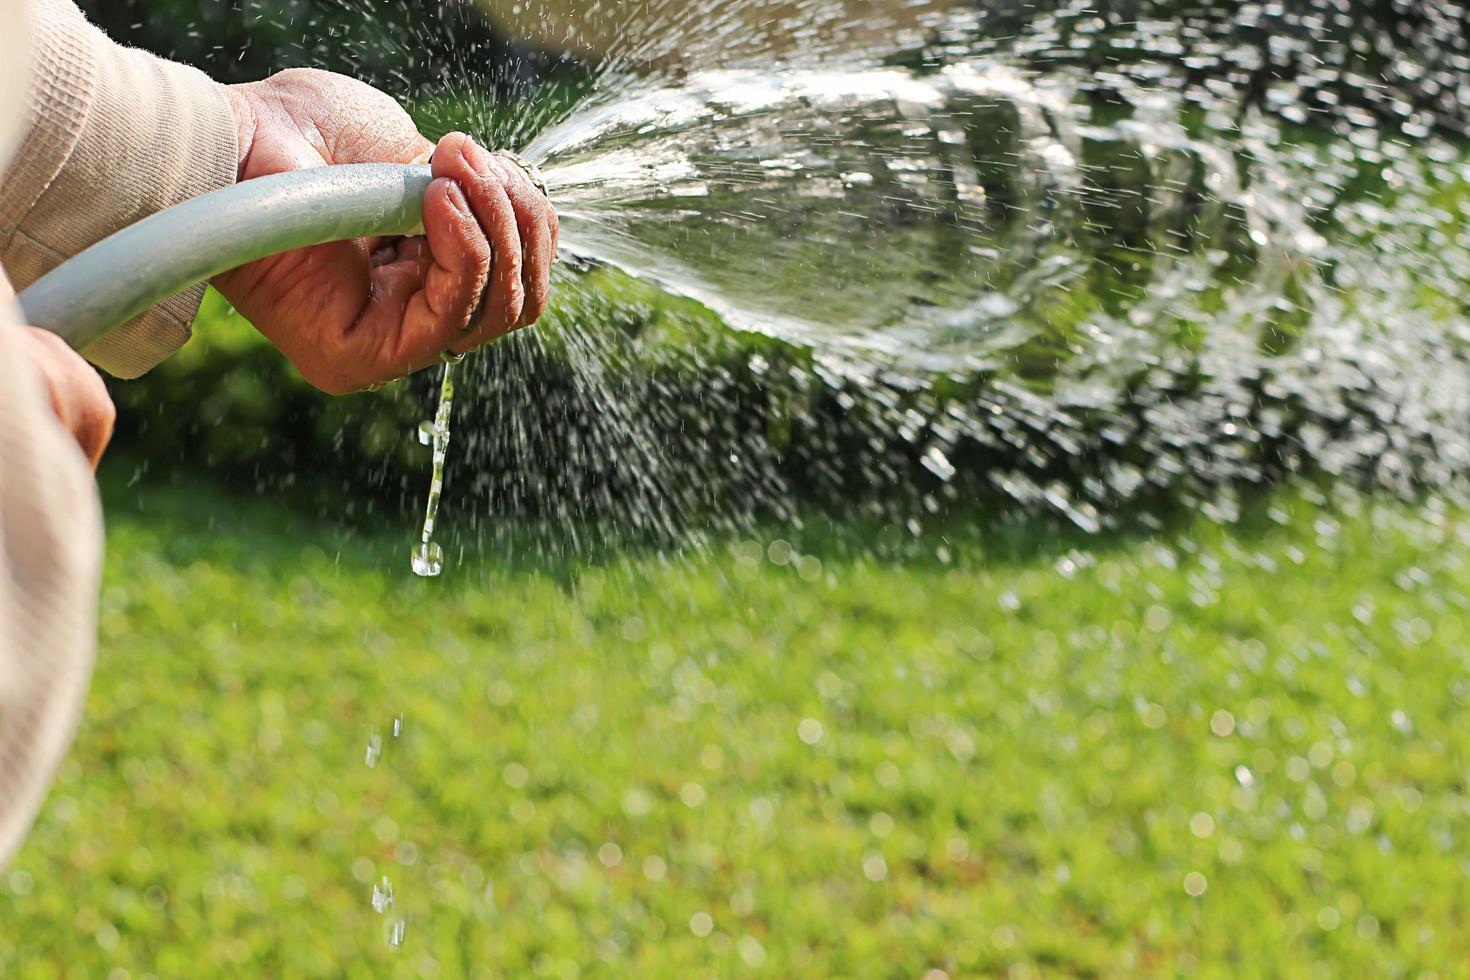 Close-up of hand holding garden hose photo